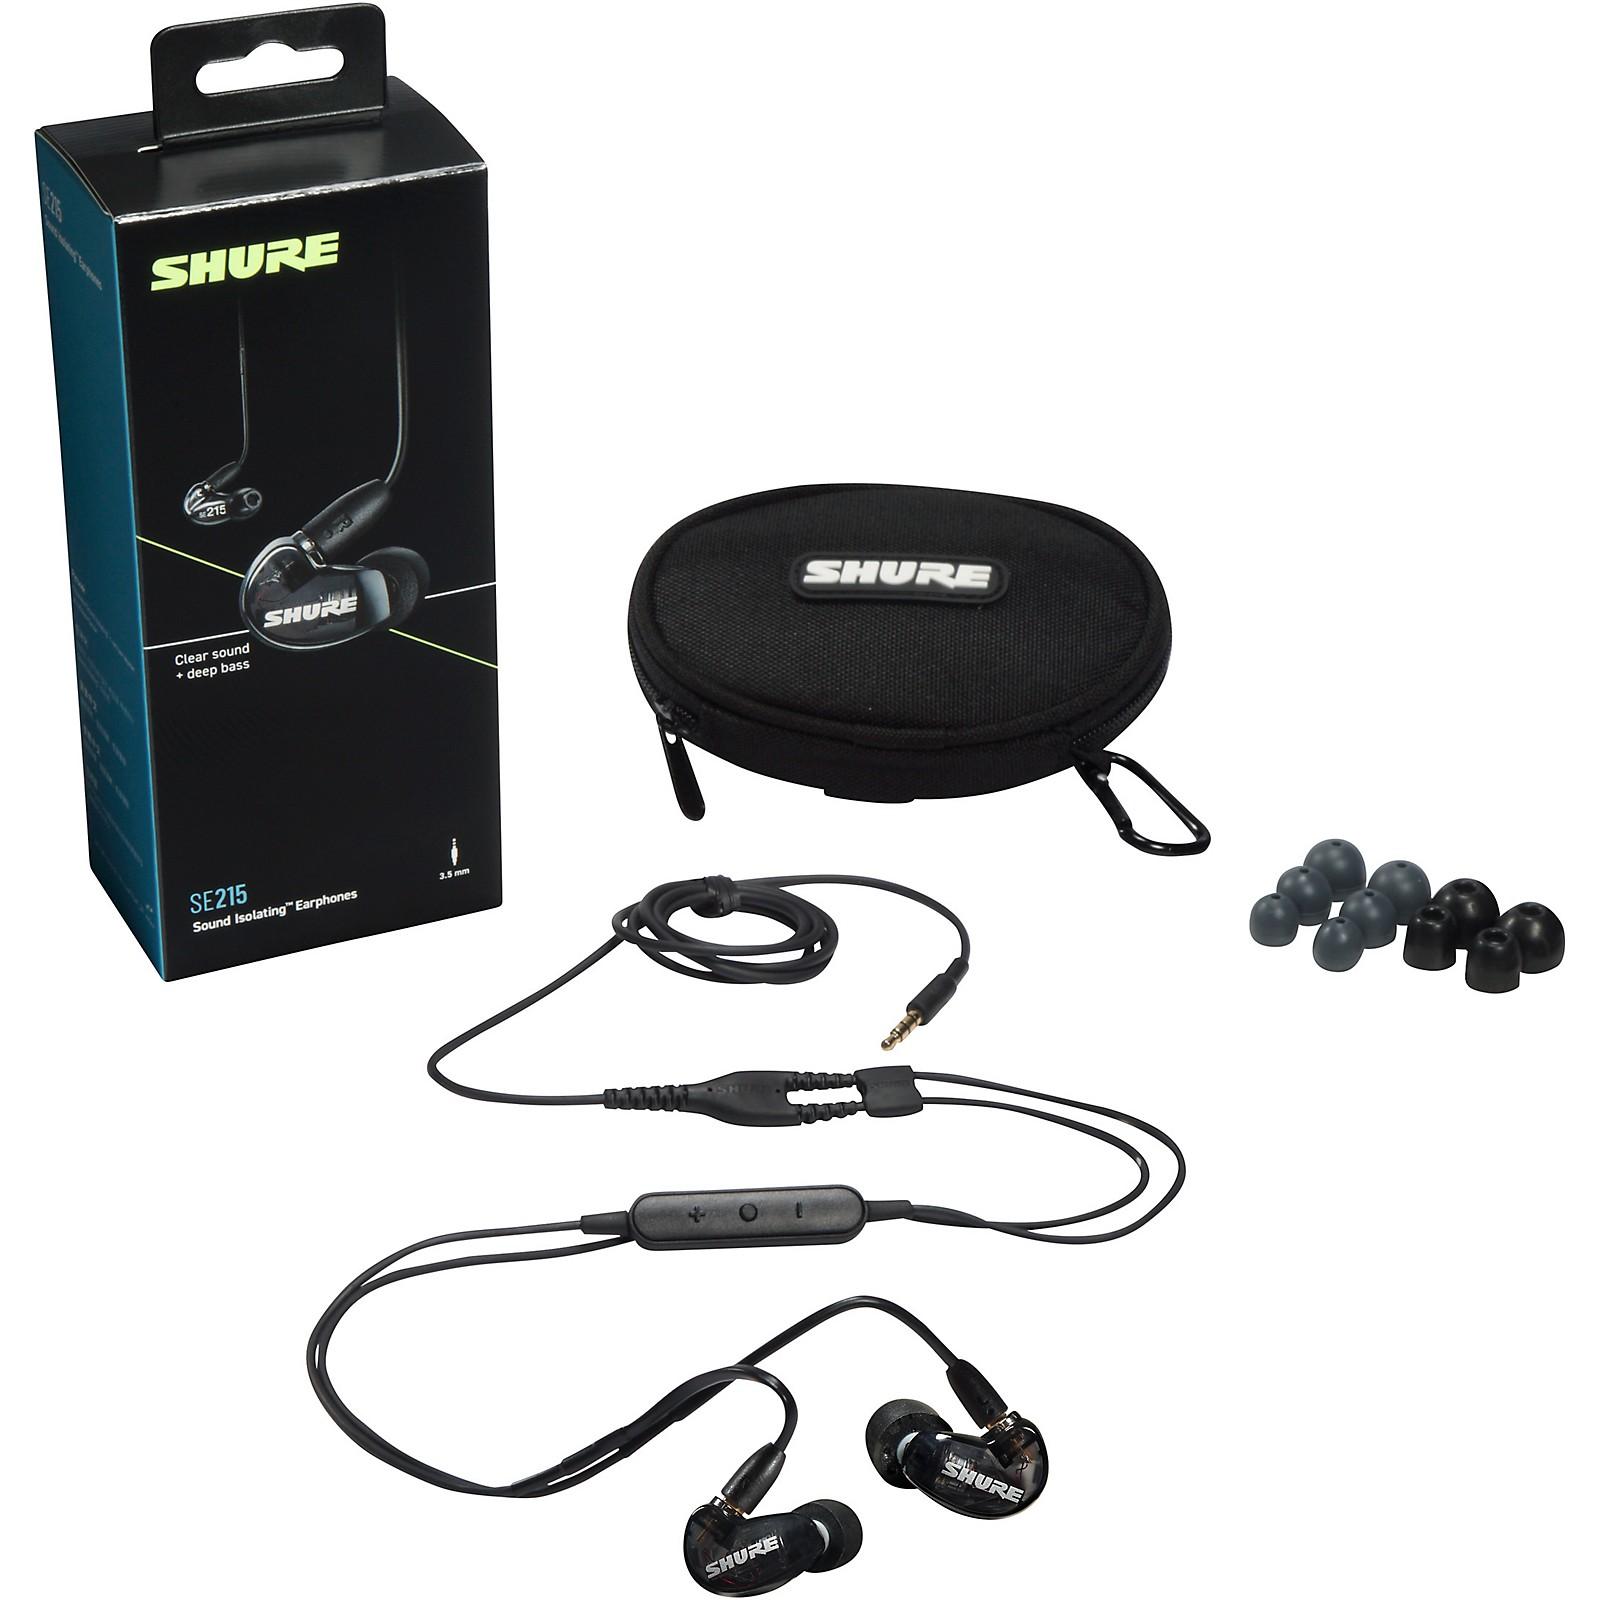 Shure SE215 Sound Isolating Earphones